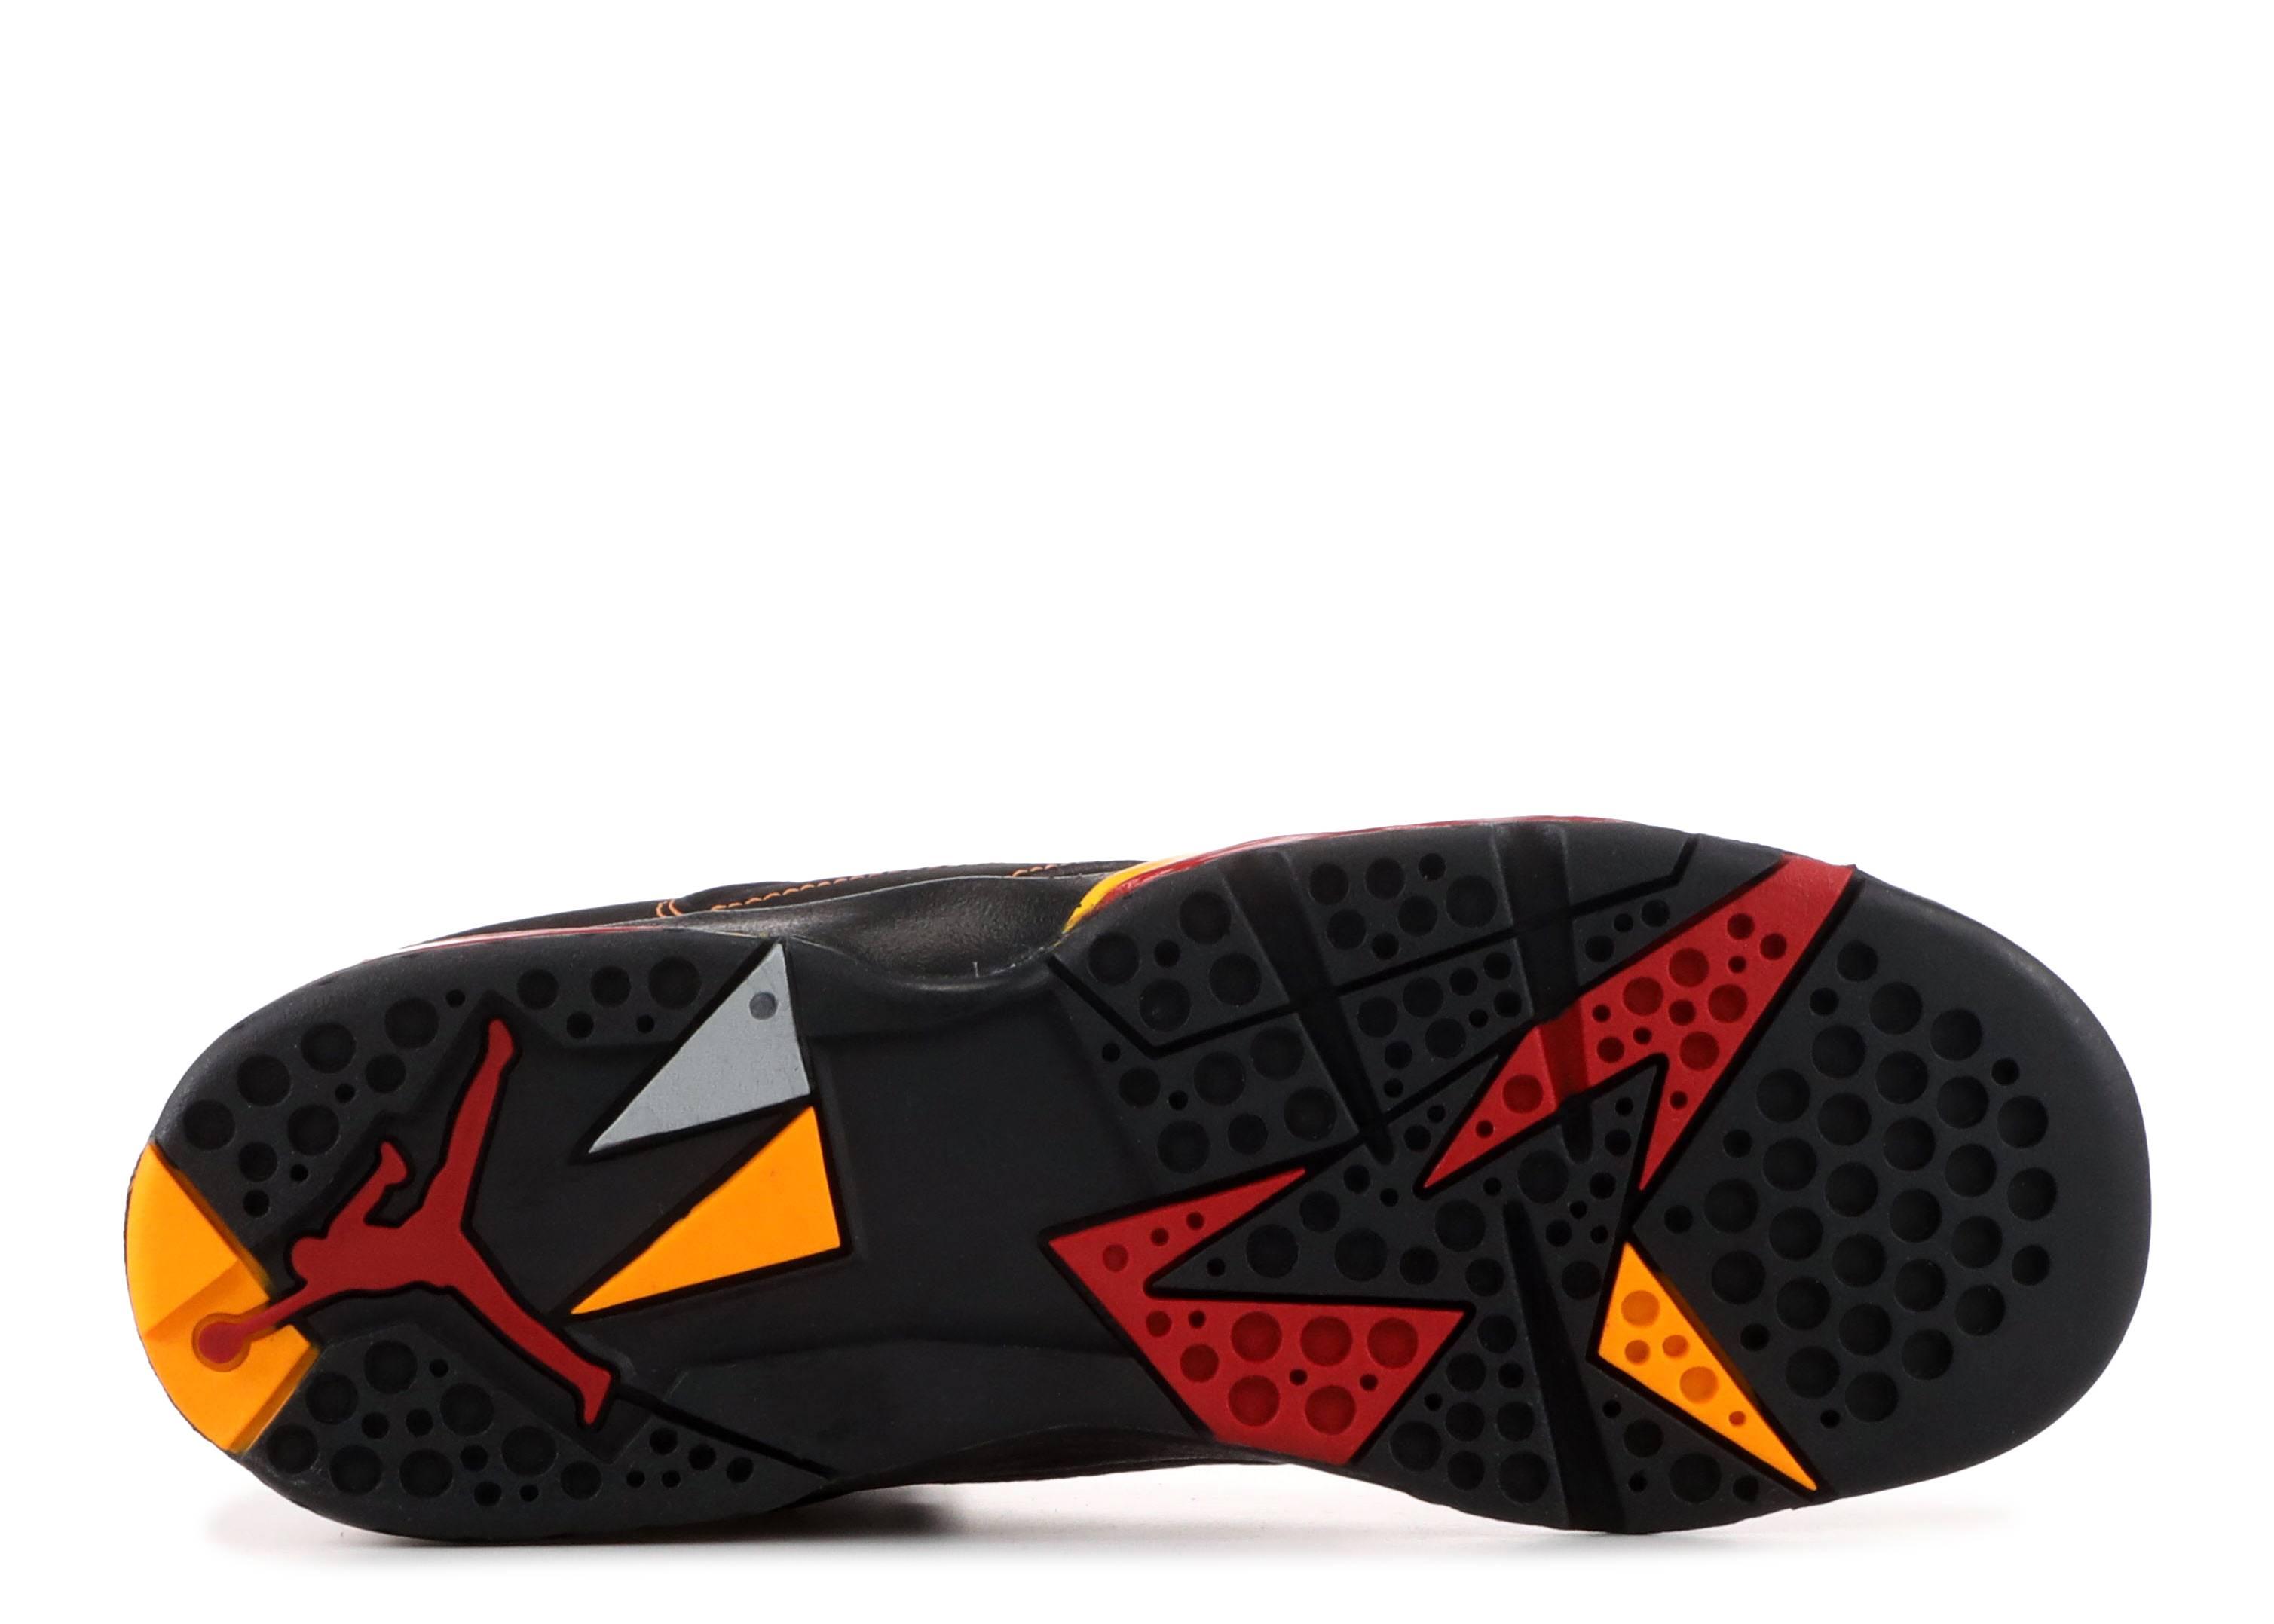 online retailer 217c6 72c9d Air Jordan 7 Retro (gs) - Air Jordan - 304774 081 - black citrus-varsity  red   Flight Club